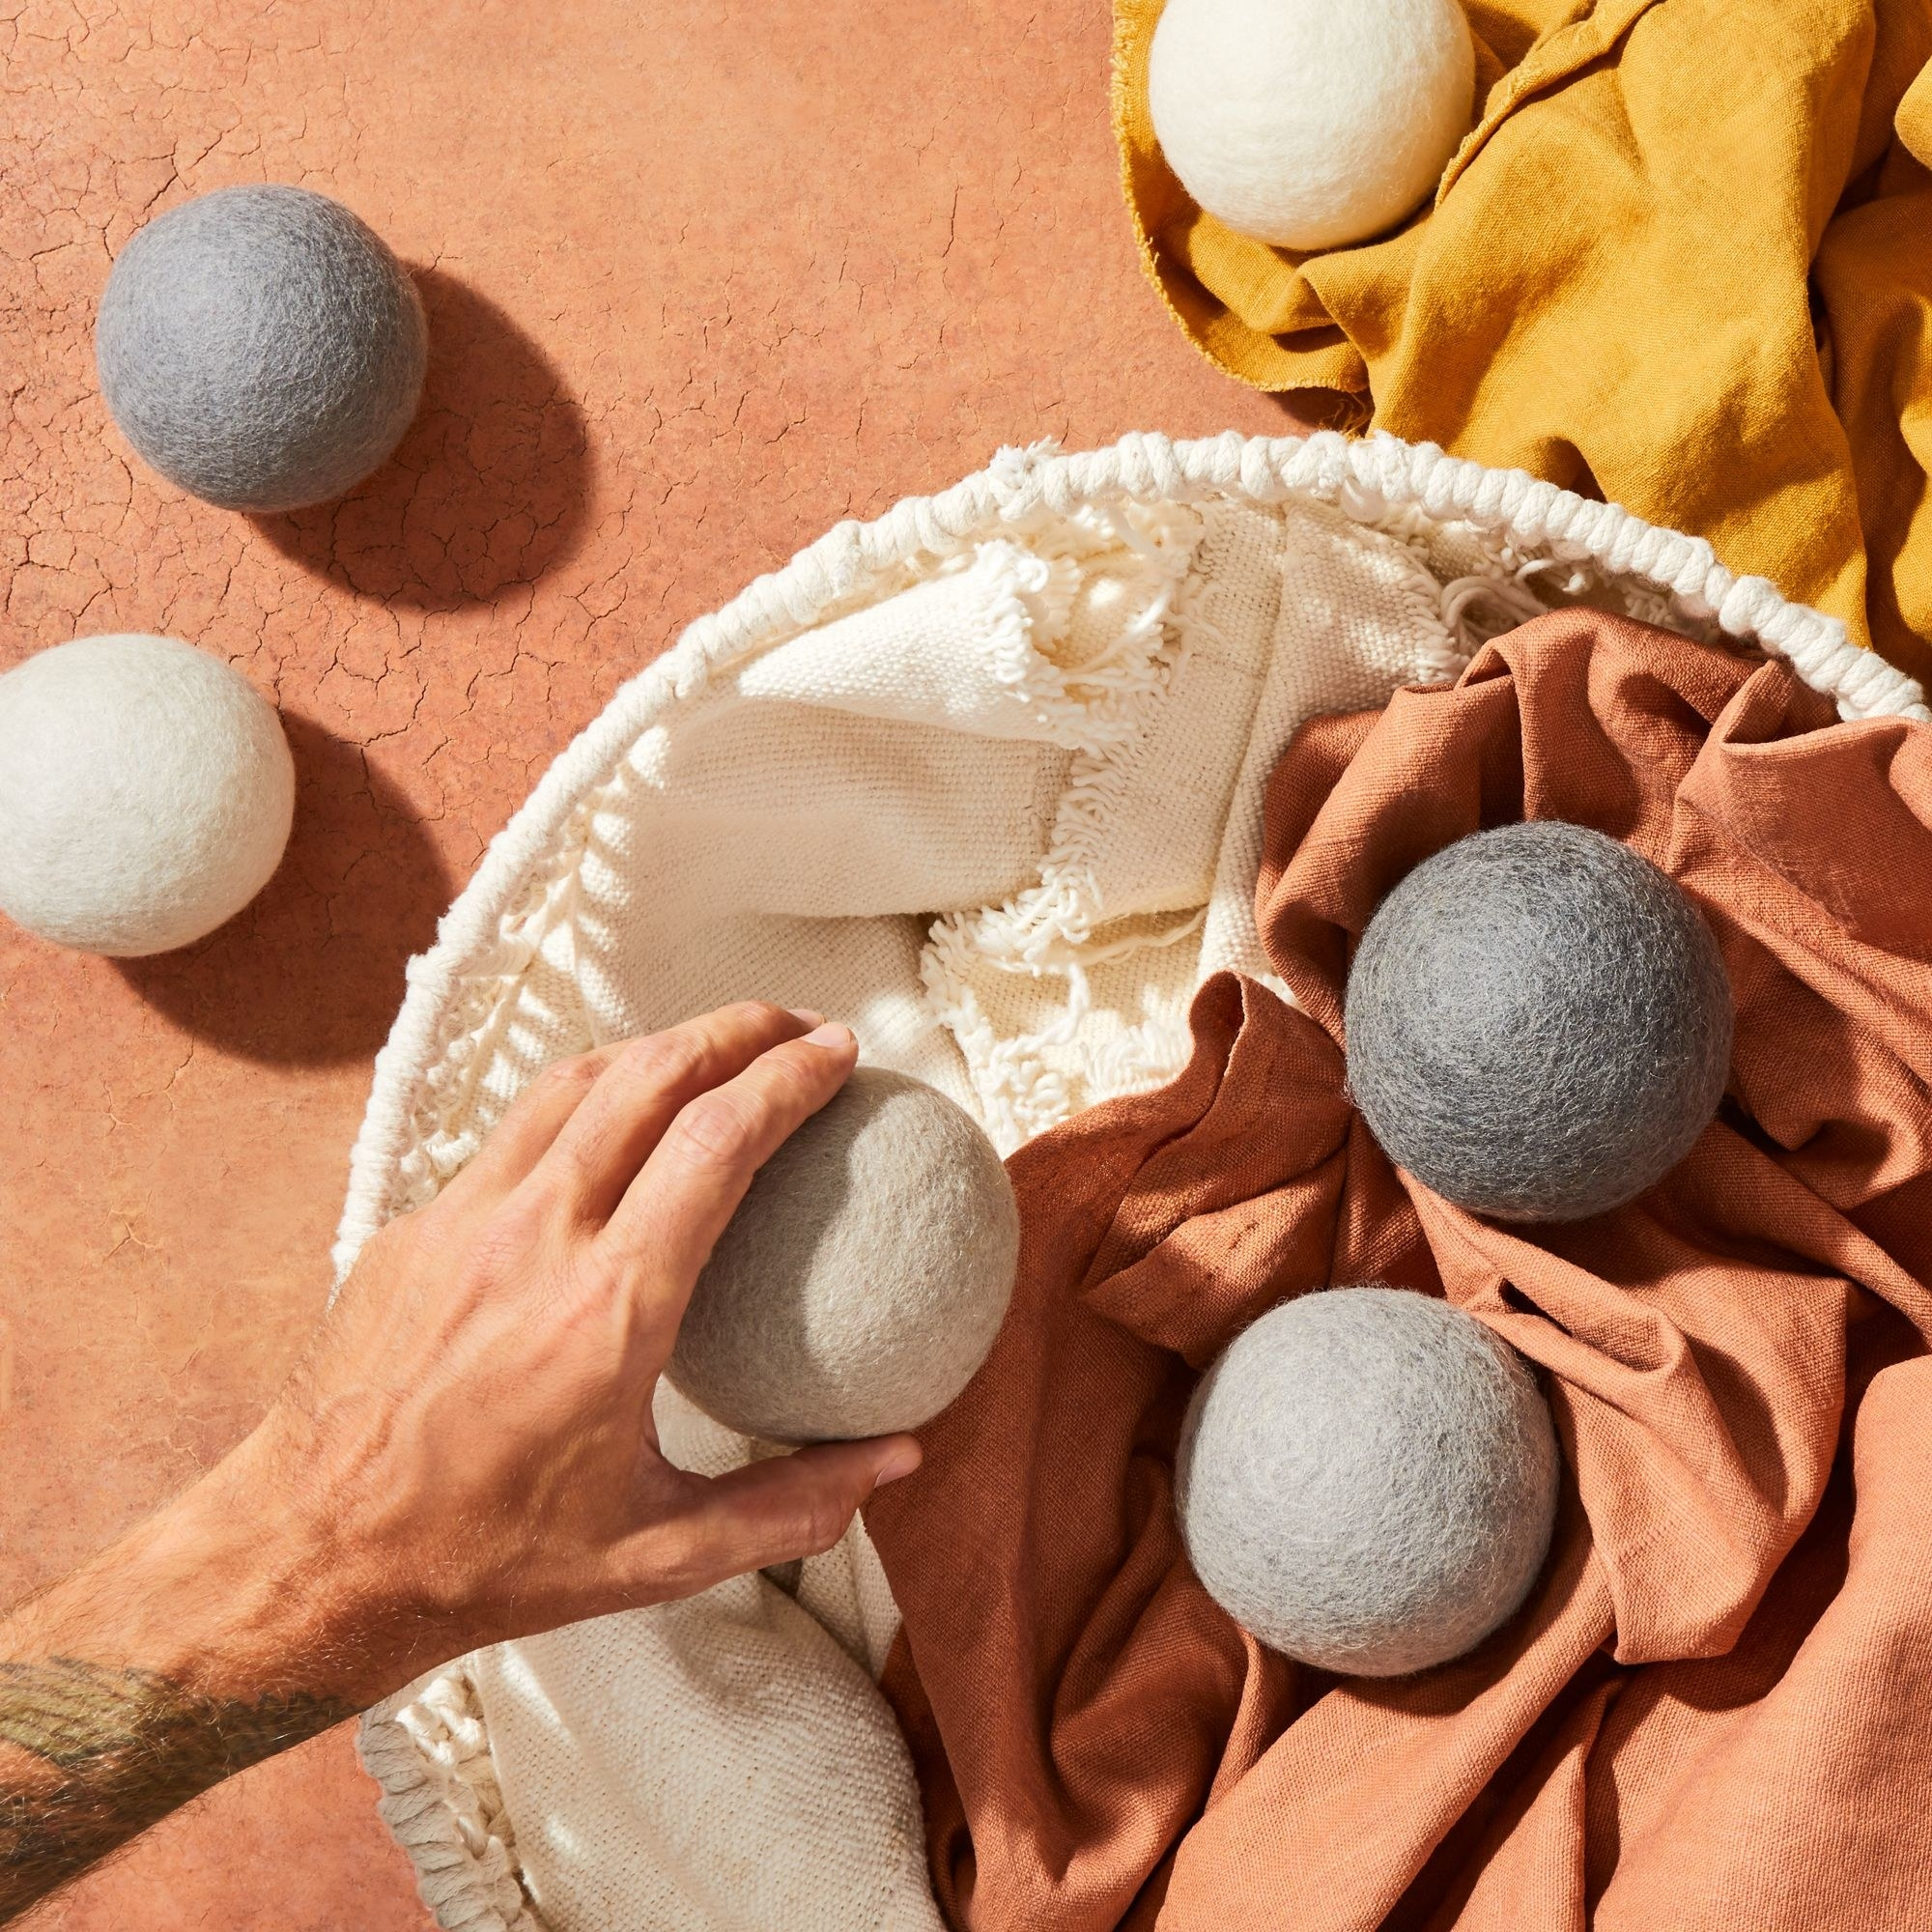 A hand reaches for a tennis-ball sized dryer ball